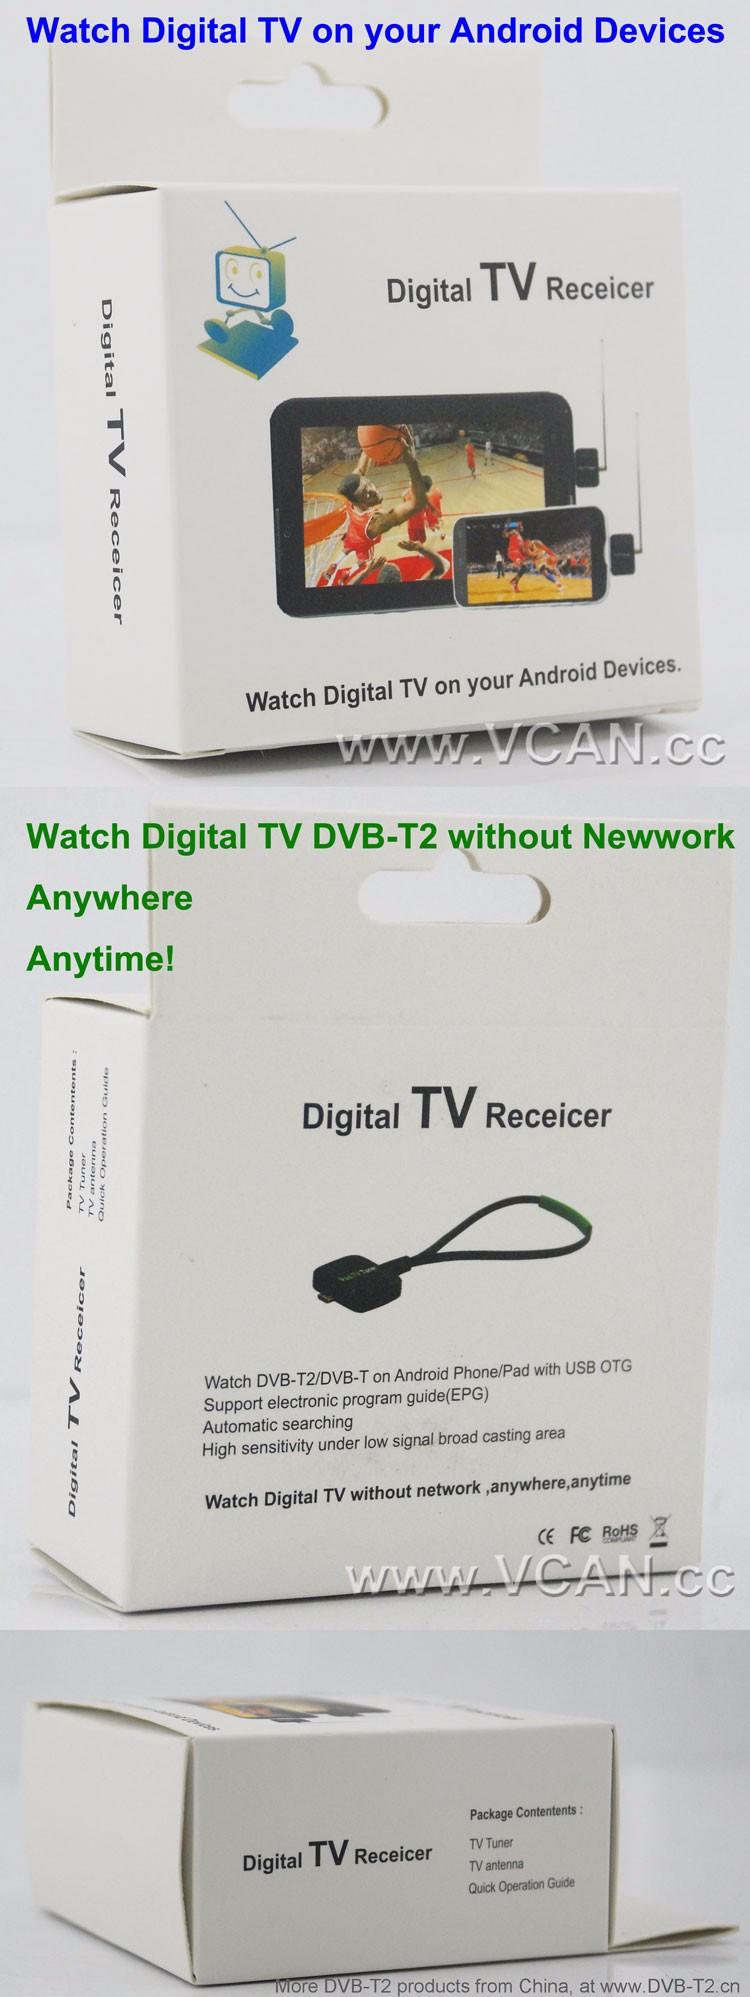 Apk Pad Tv Tuner Dvb-t2s Android Mini Usb Tv Tuner Dvb-t Dvb-t2 Tv Tuner  Receiver For Android Tablet - Buy Apk Pad Tv Tuner,Android Mini Usb Tv